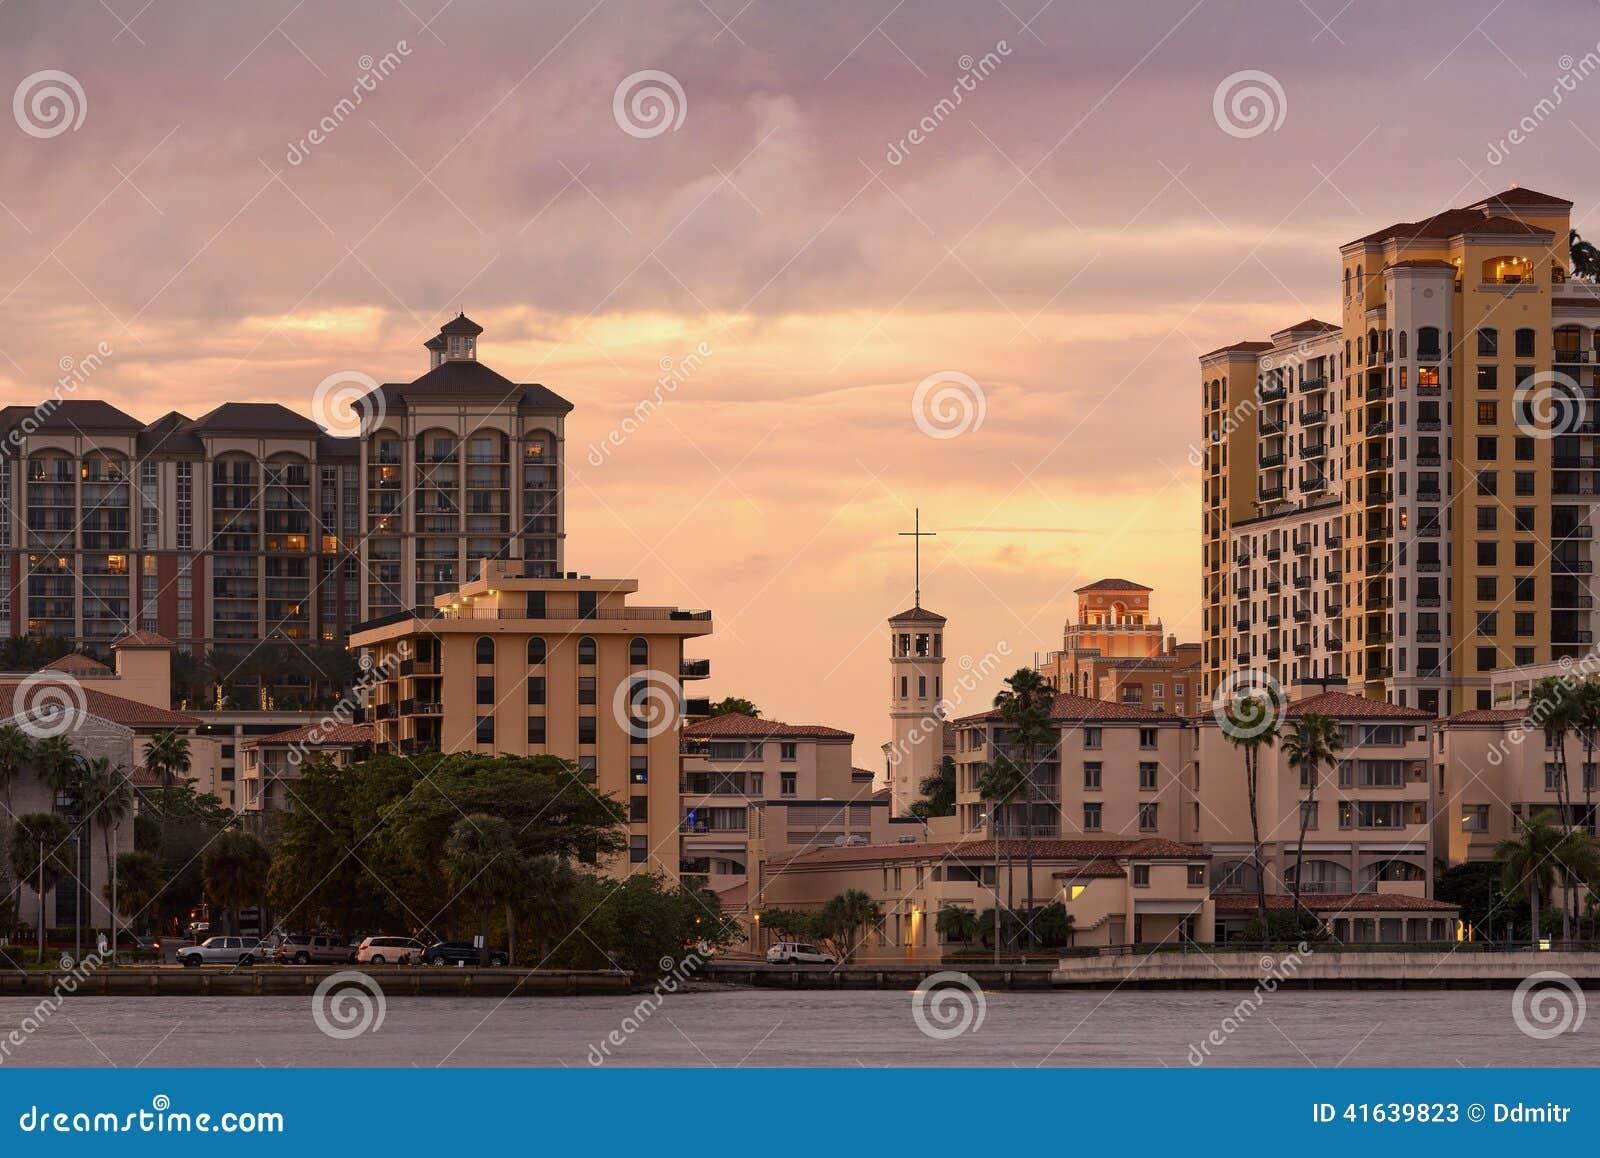 West Palm Beach (FL) United States  city photo : West Palm Beach, Florida, United States.